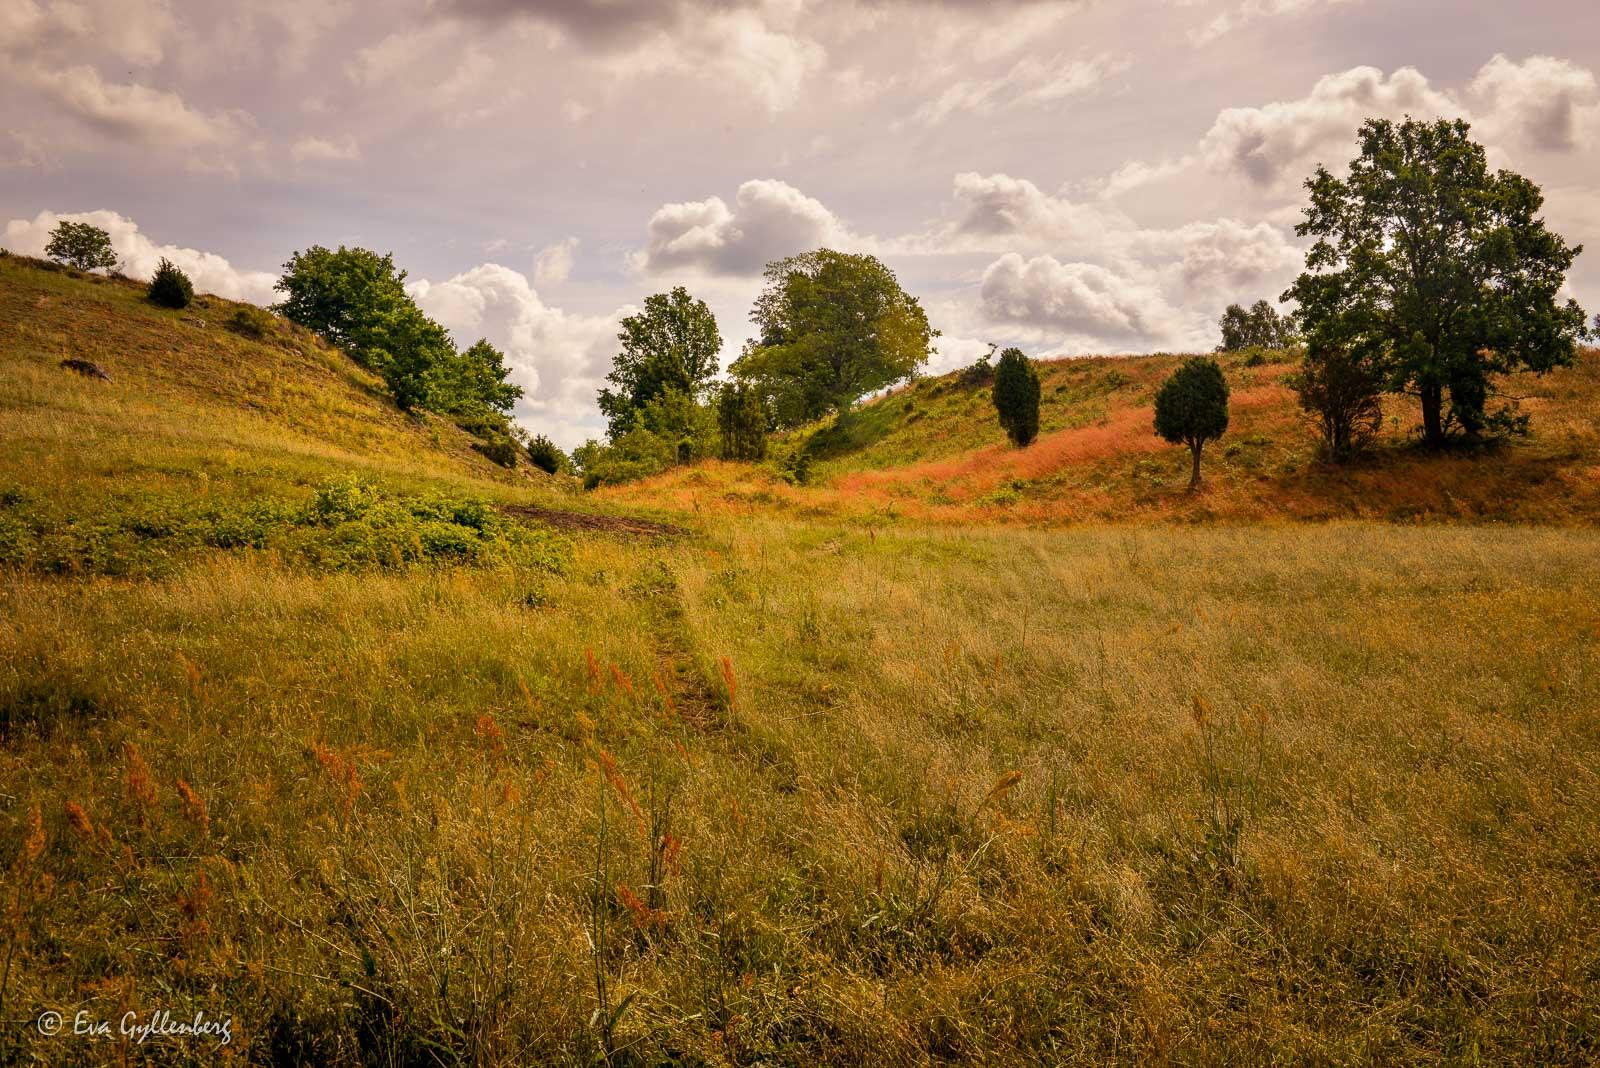 Lite Toscana-känsla i Skåne